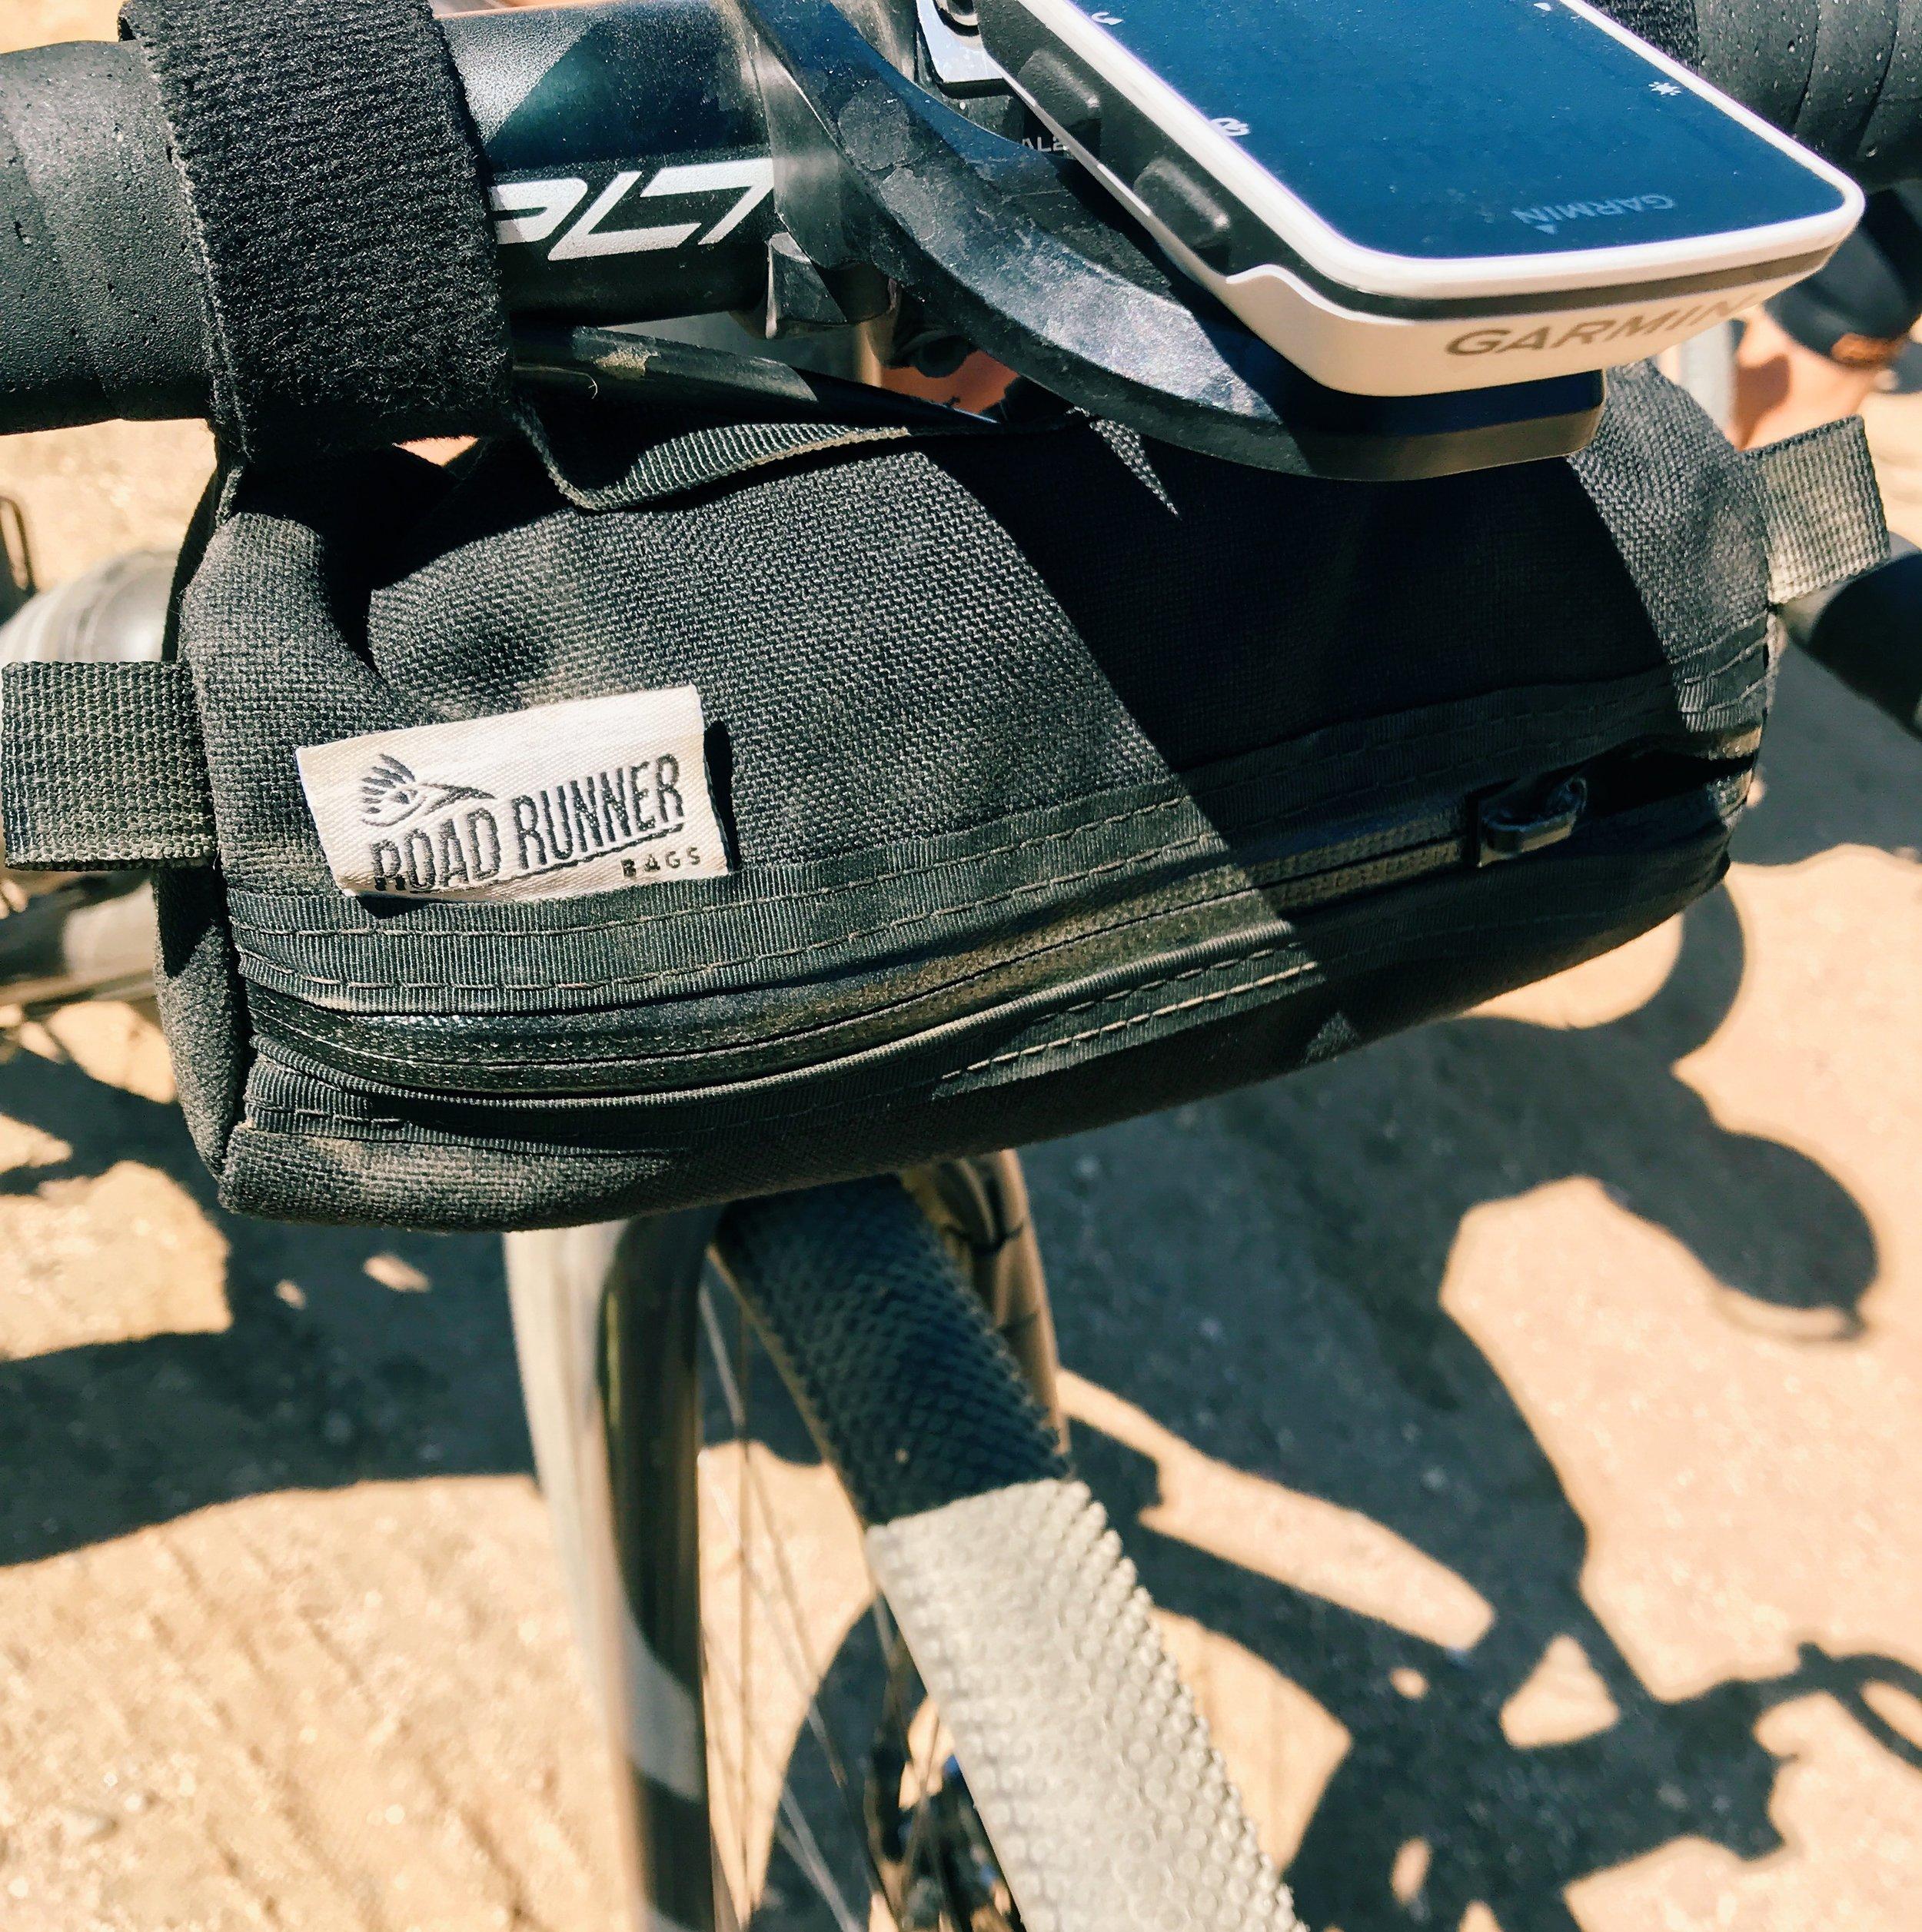 Dirty Clarity 50_road runner.JPG